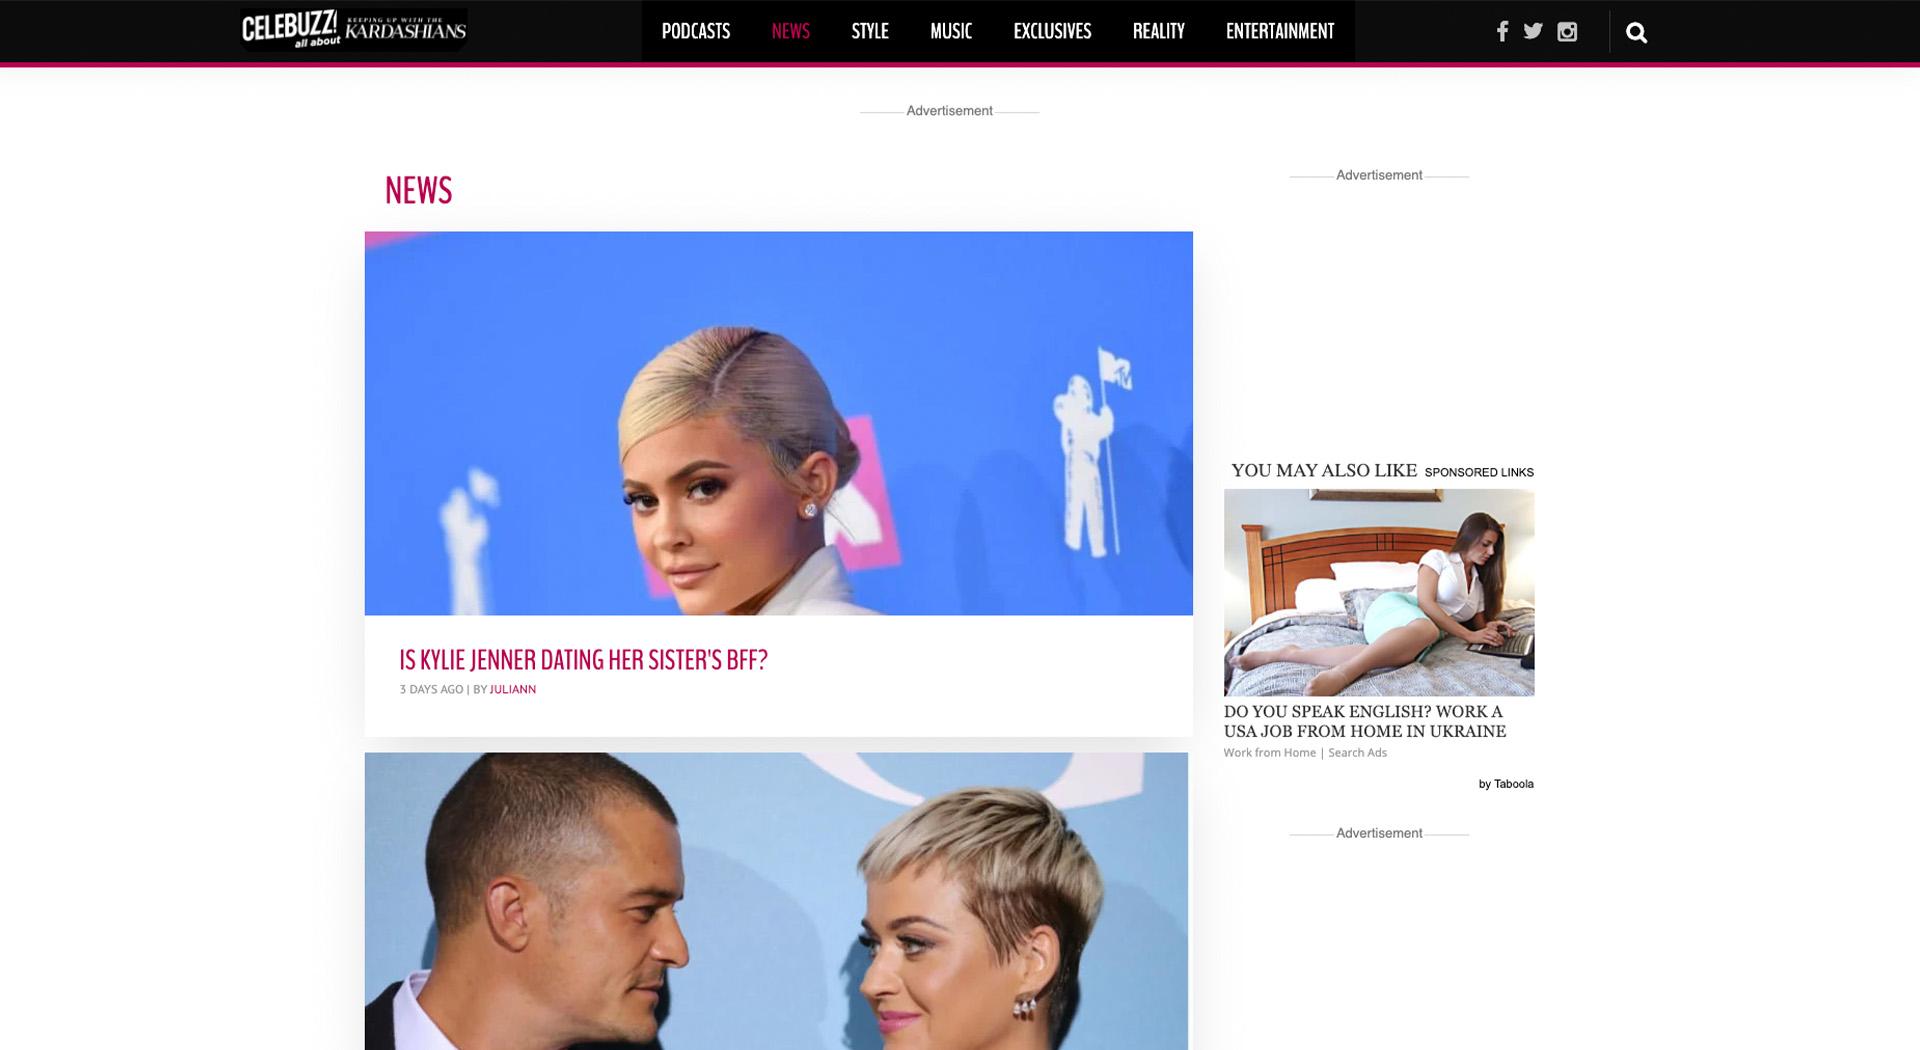 Celebuzz: funny websites for boredom